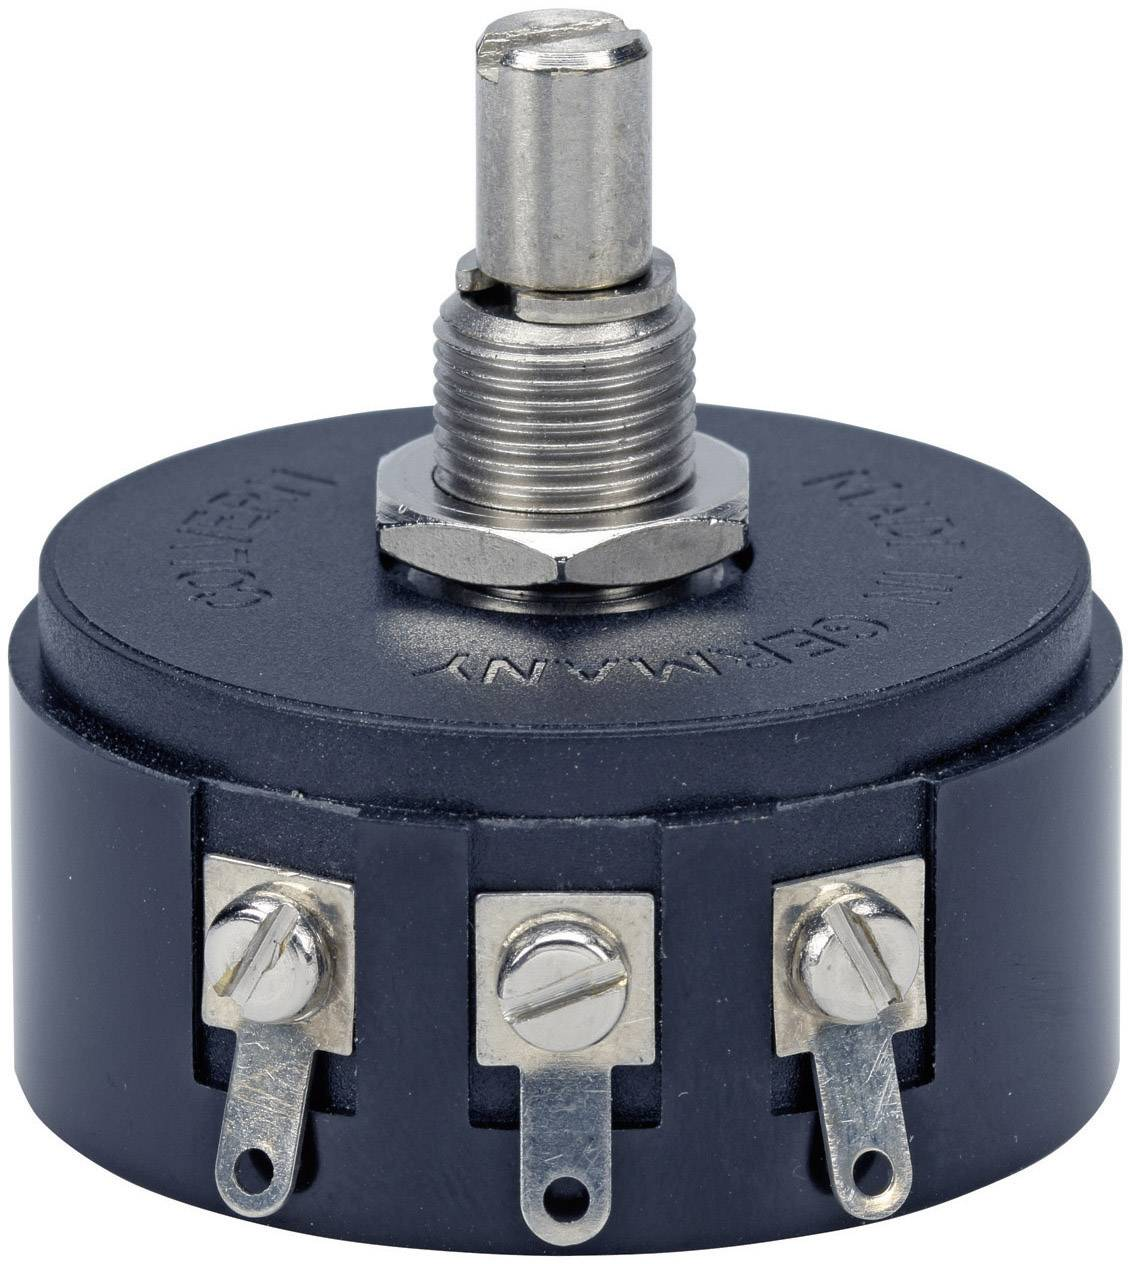 Drôtový potenciometer mono TT Electronics AB 3104001105 3104001105, 3 W, 50 Ohm, 1 ks